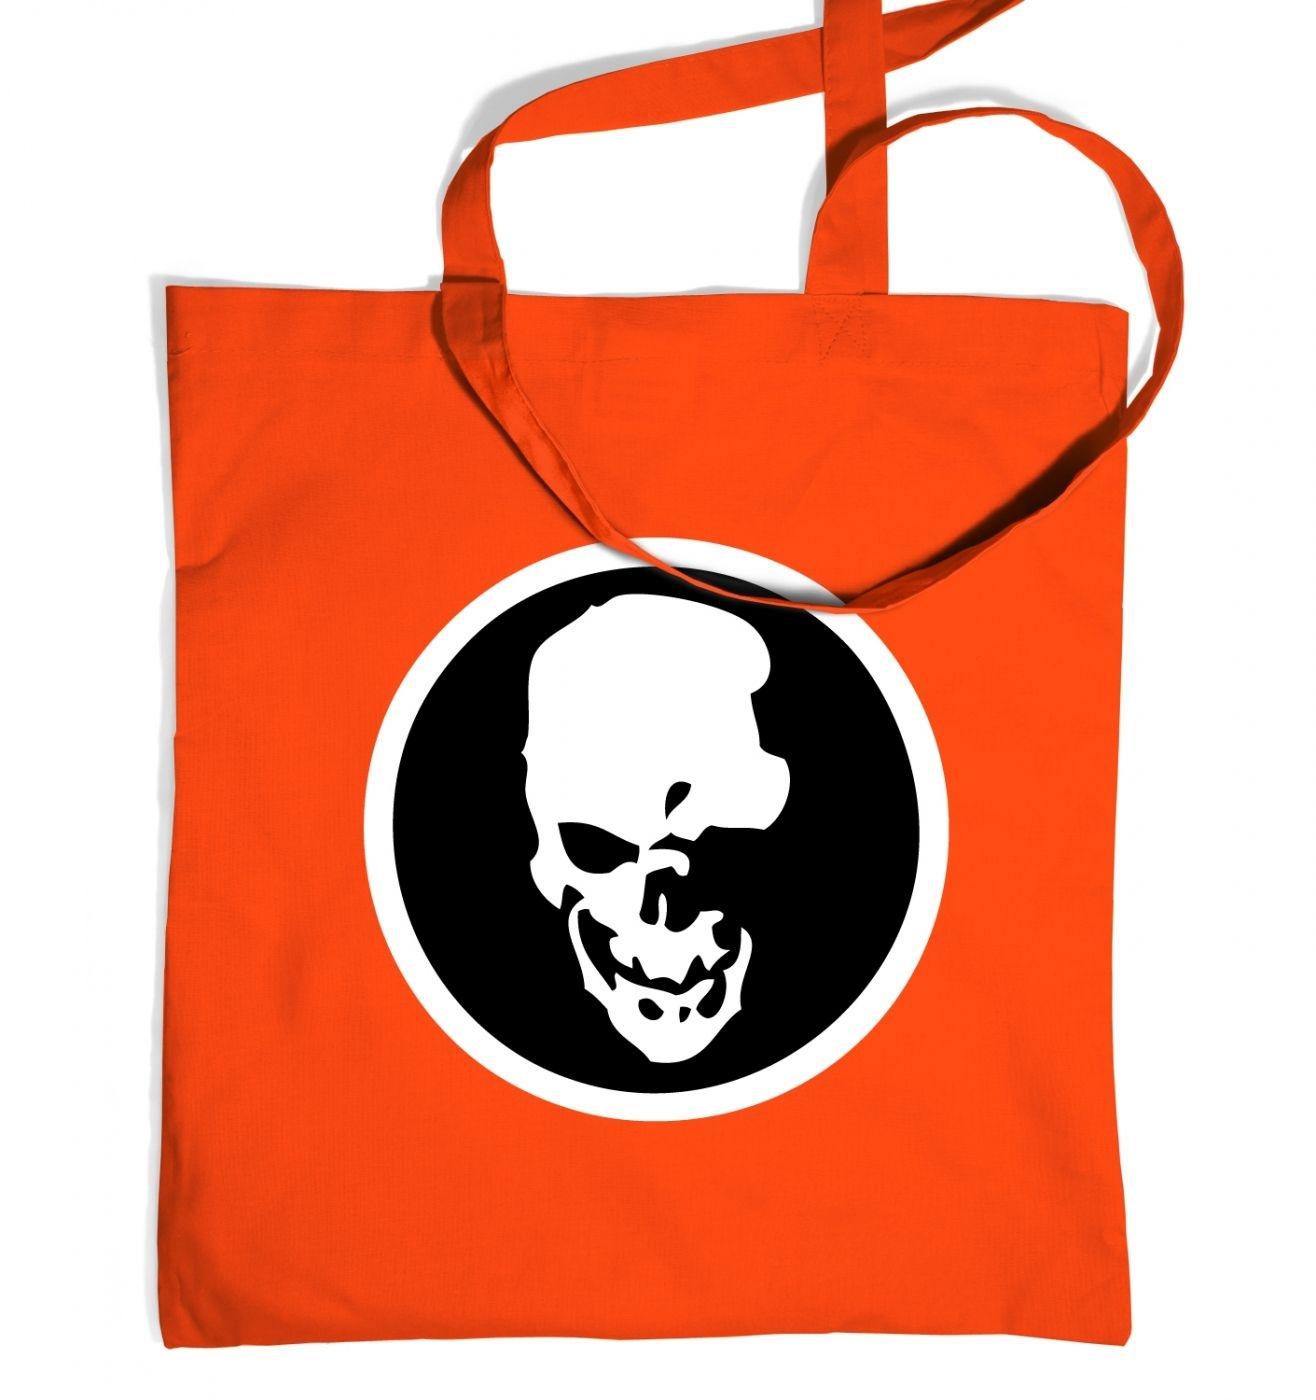 Shinigami Skull tote bag